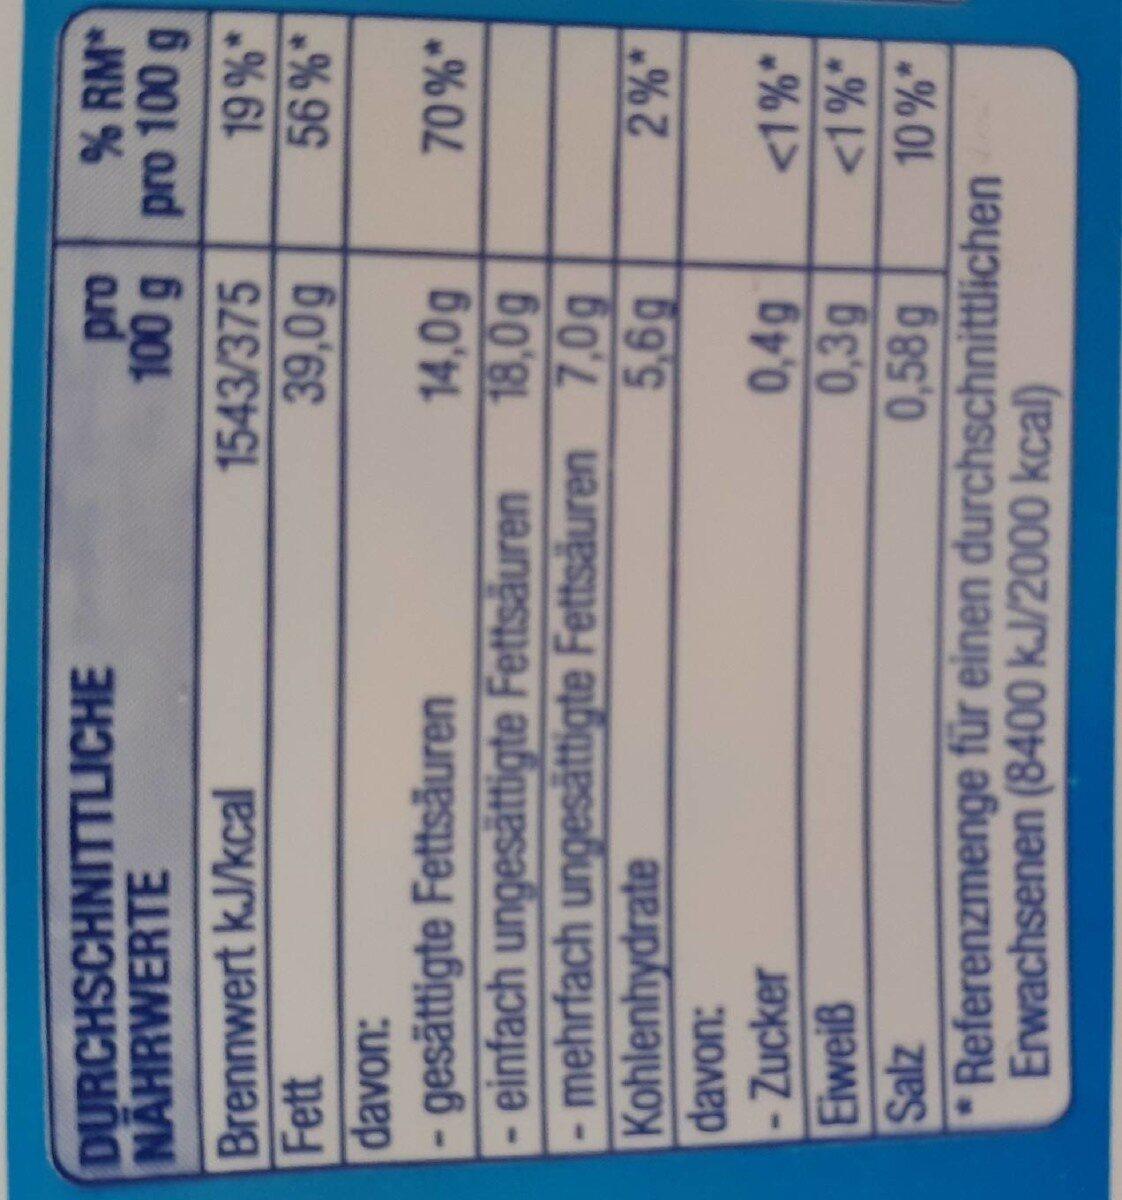 Die Leichte - Valori nutrizionali - de